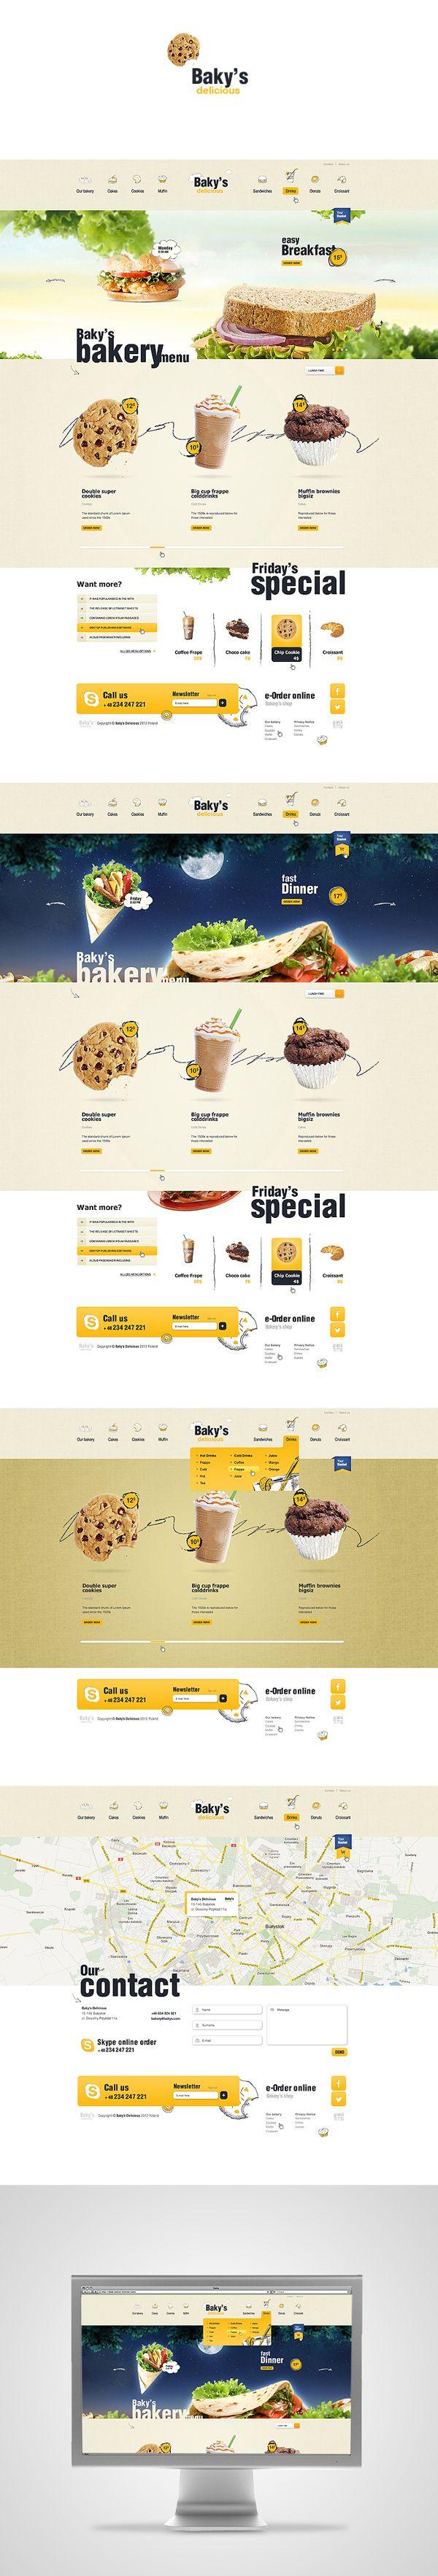 Baky's Delicious Webdesign Inspiration| #webdesign #it #web #design #layout #userinterface #website #webdesign < repinned by www.BlickeDeeler.de | Take a look at www.WebsiteDesign-Hamburg.de